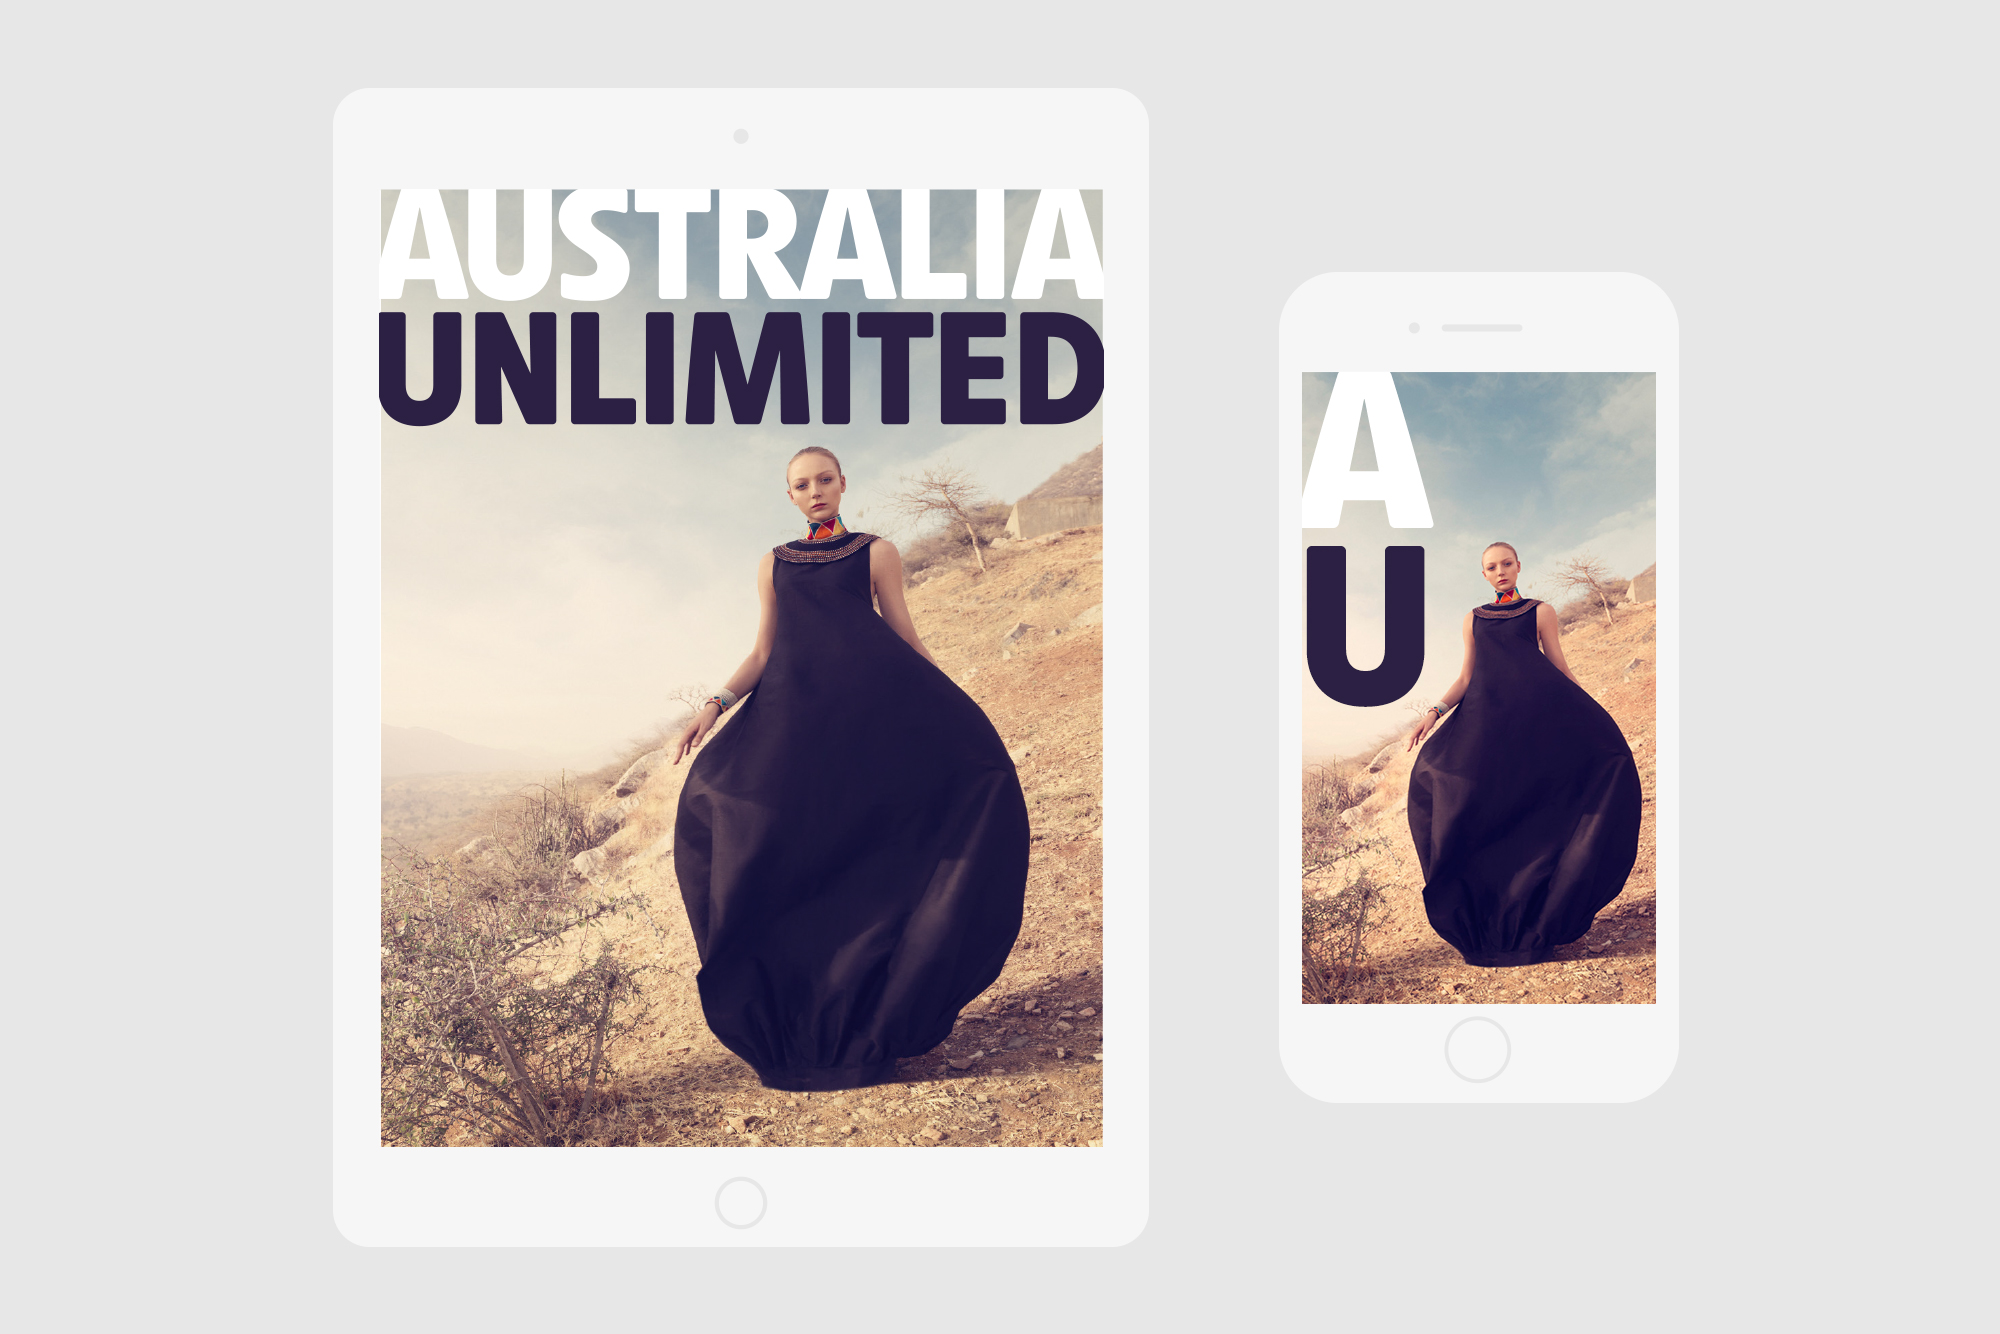 ReAgency_AustraliaUnlimited_Brand_IpadIphone_Digital_02.jpg